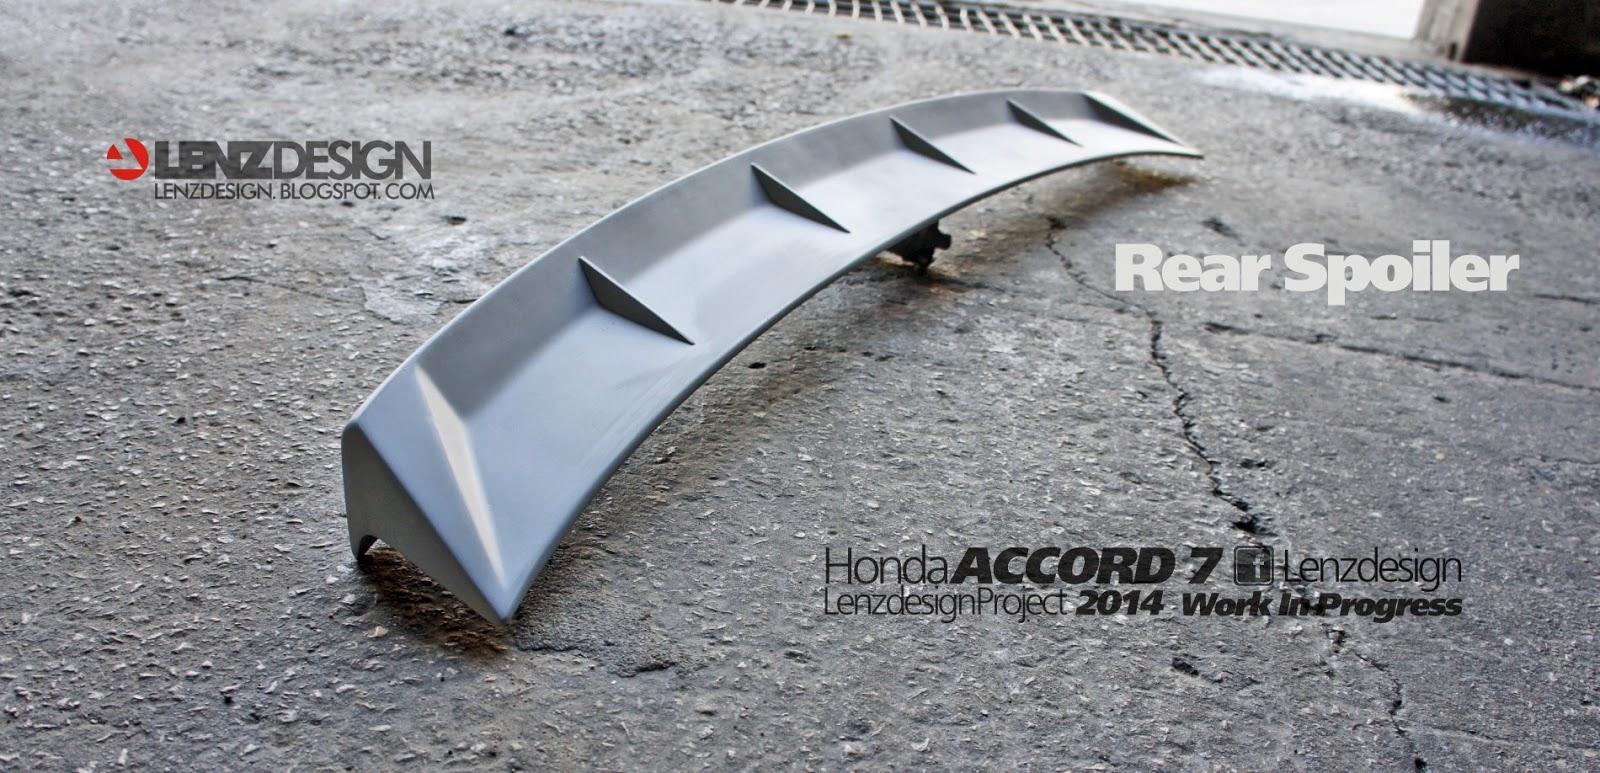 Honda accord 7 tuning lenzdesign performance